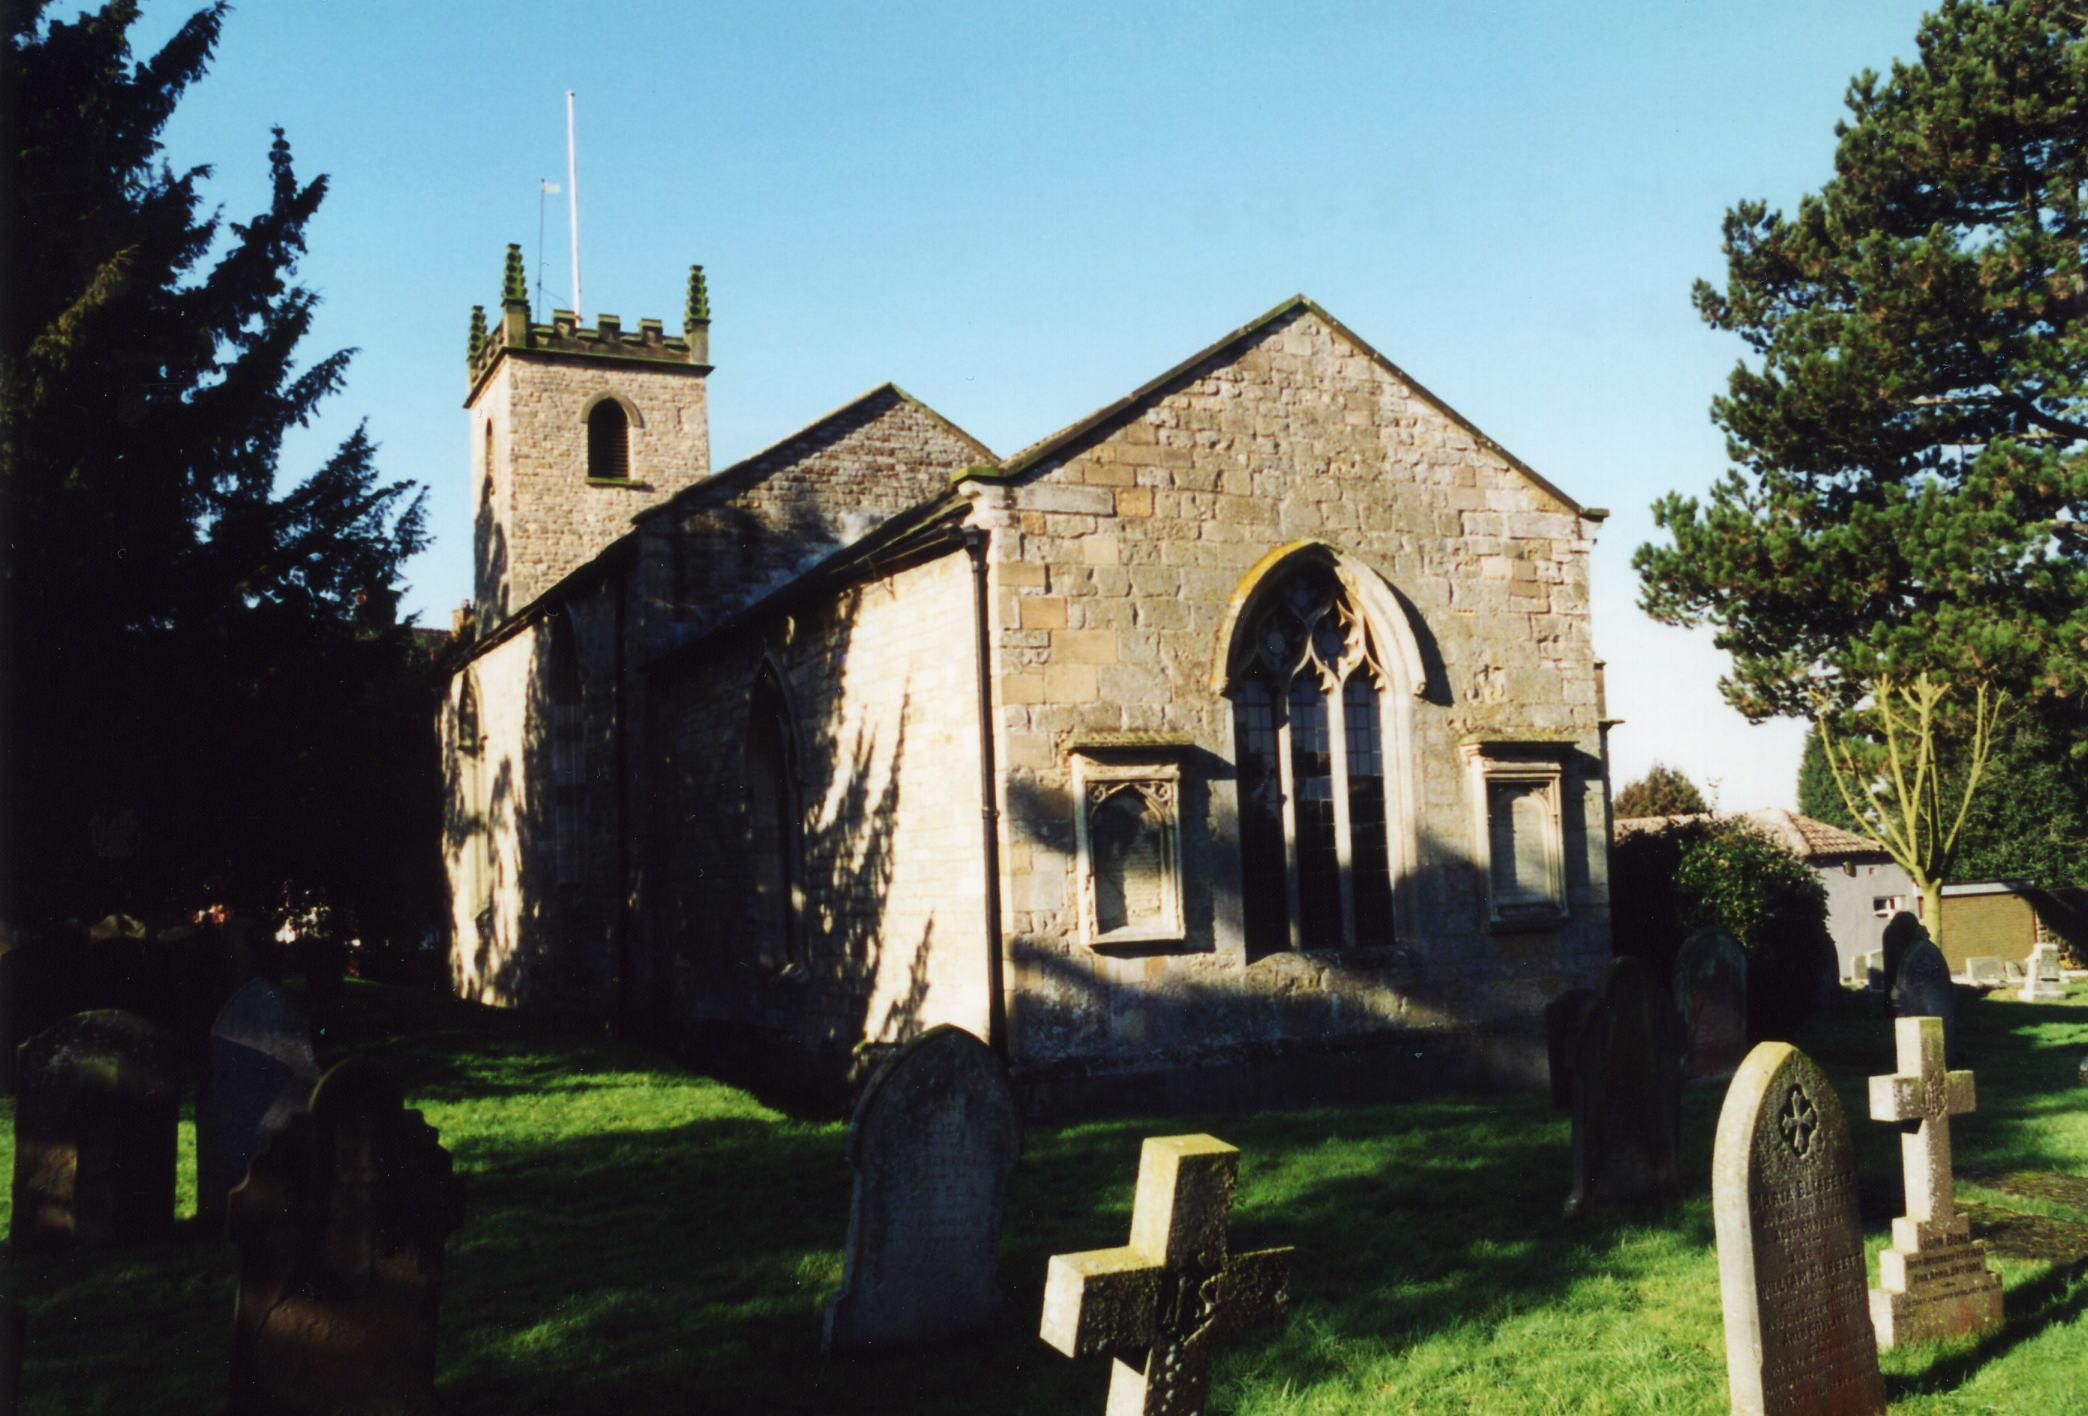 Canwick All Saints parish church